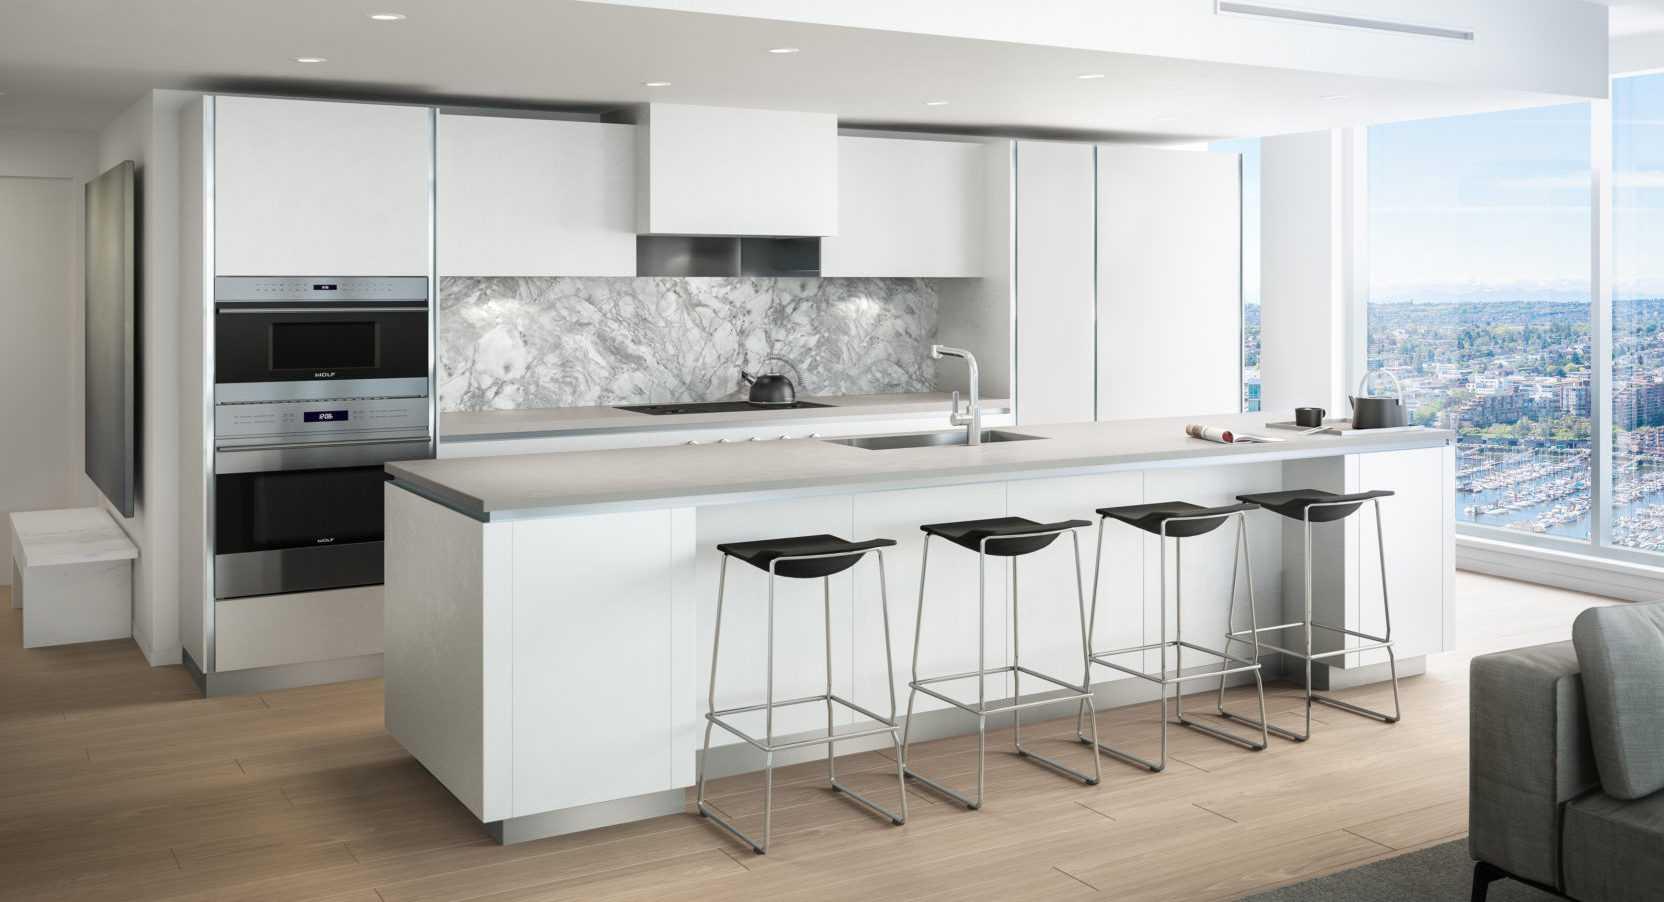 normli_170828_int_3bed_kitchen_lighte1516909385812.jpg!